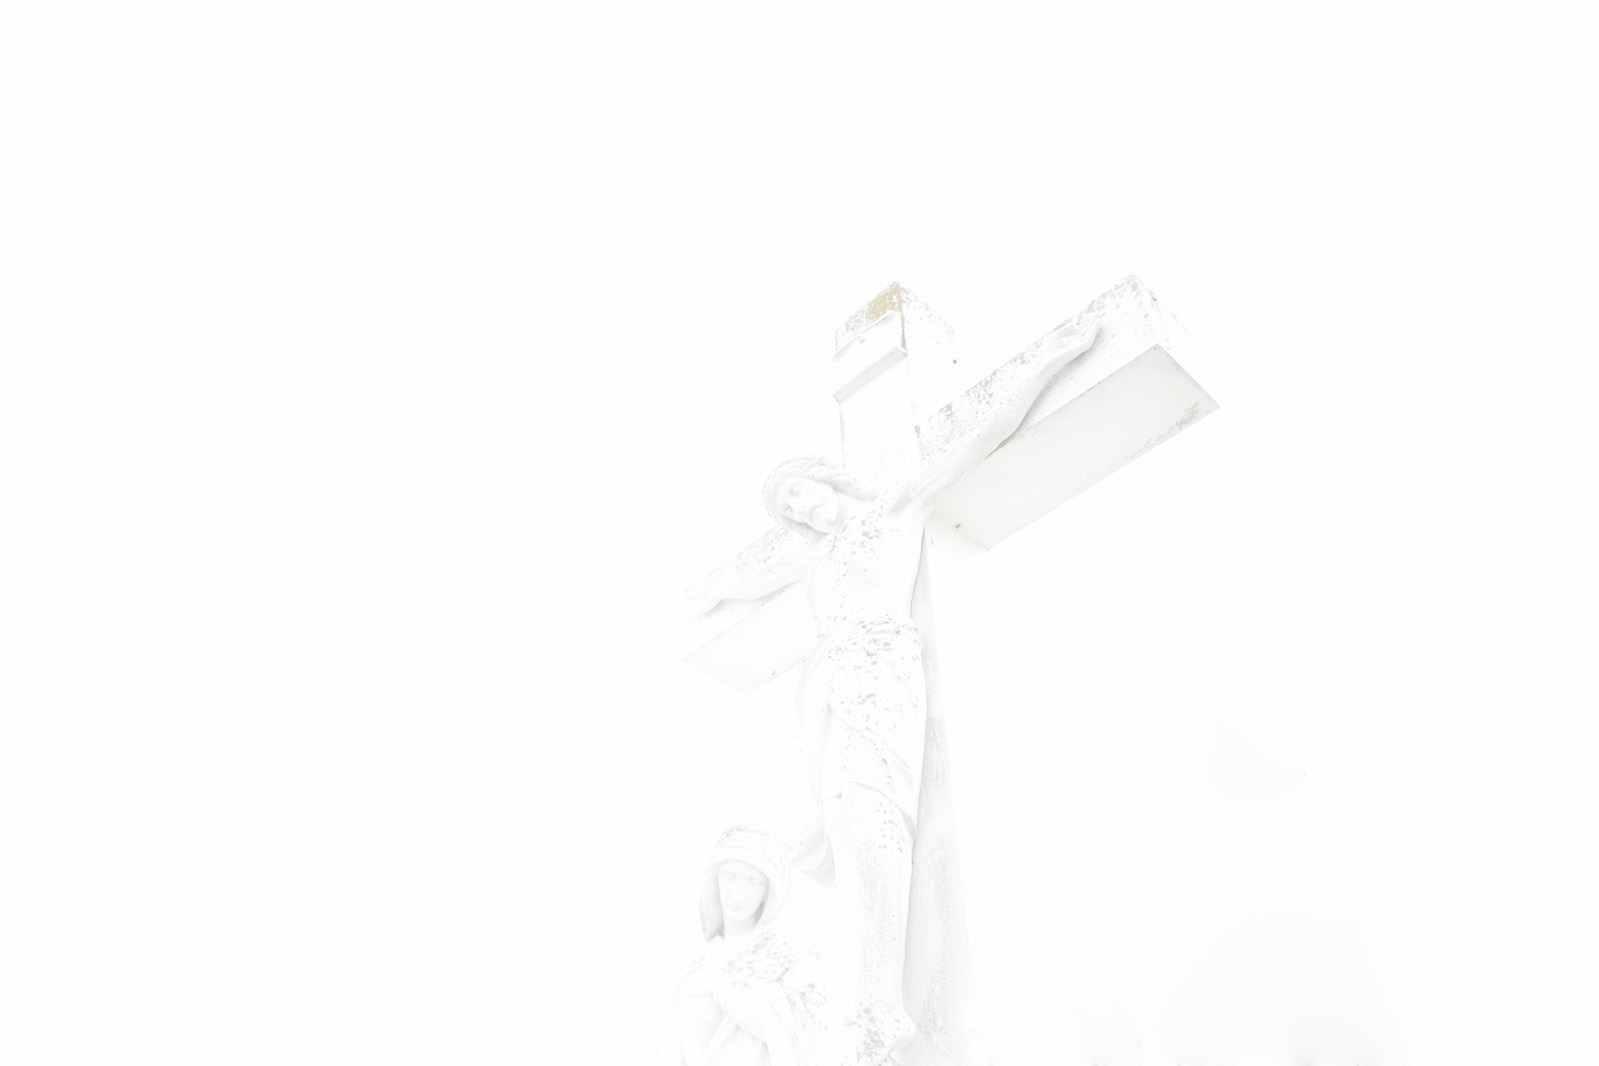 michael-webster-soitude11